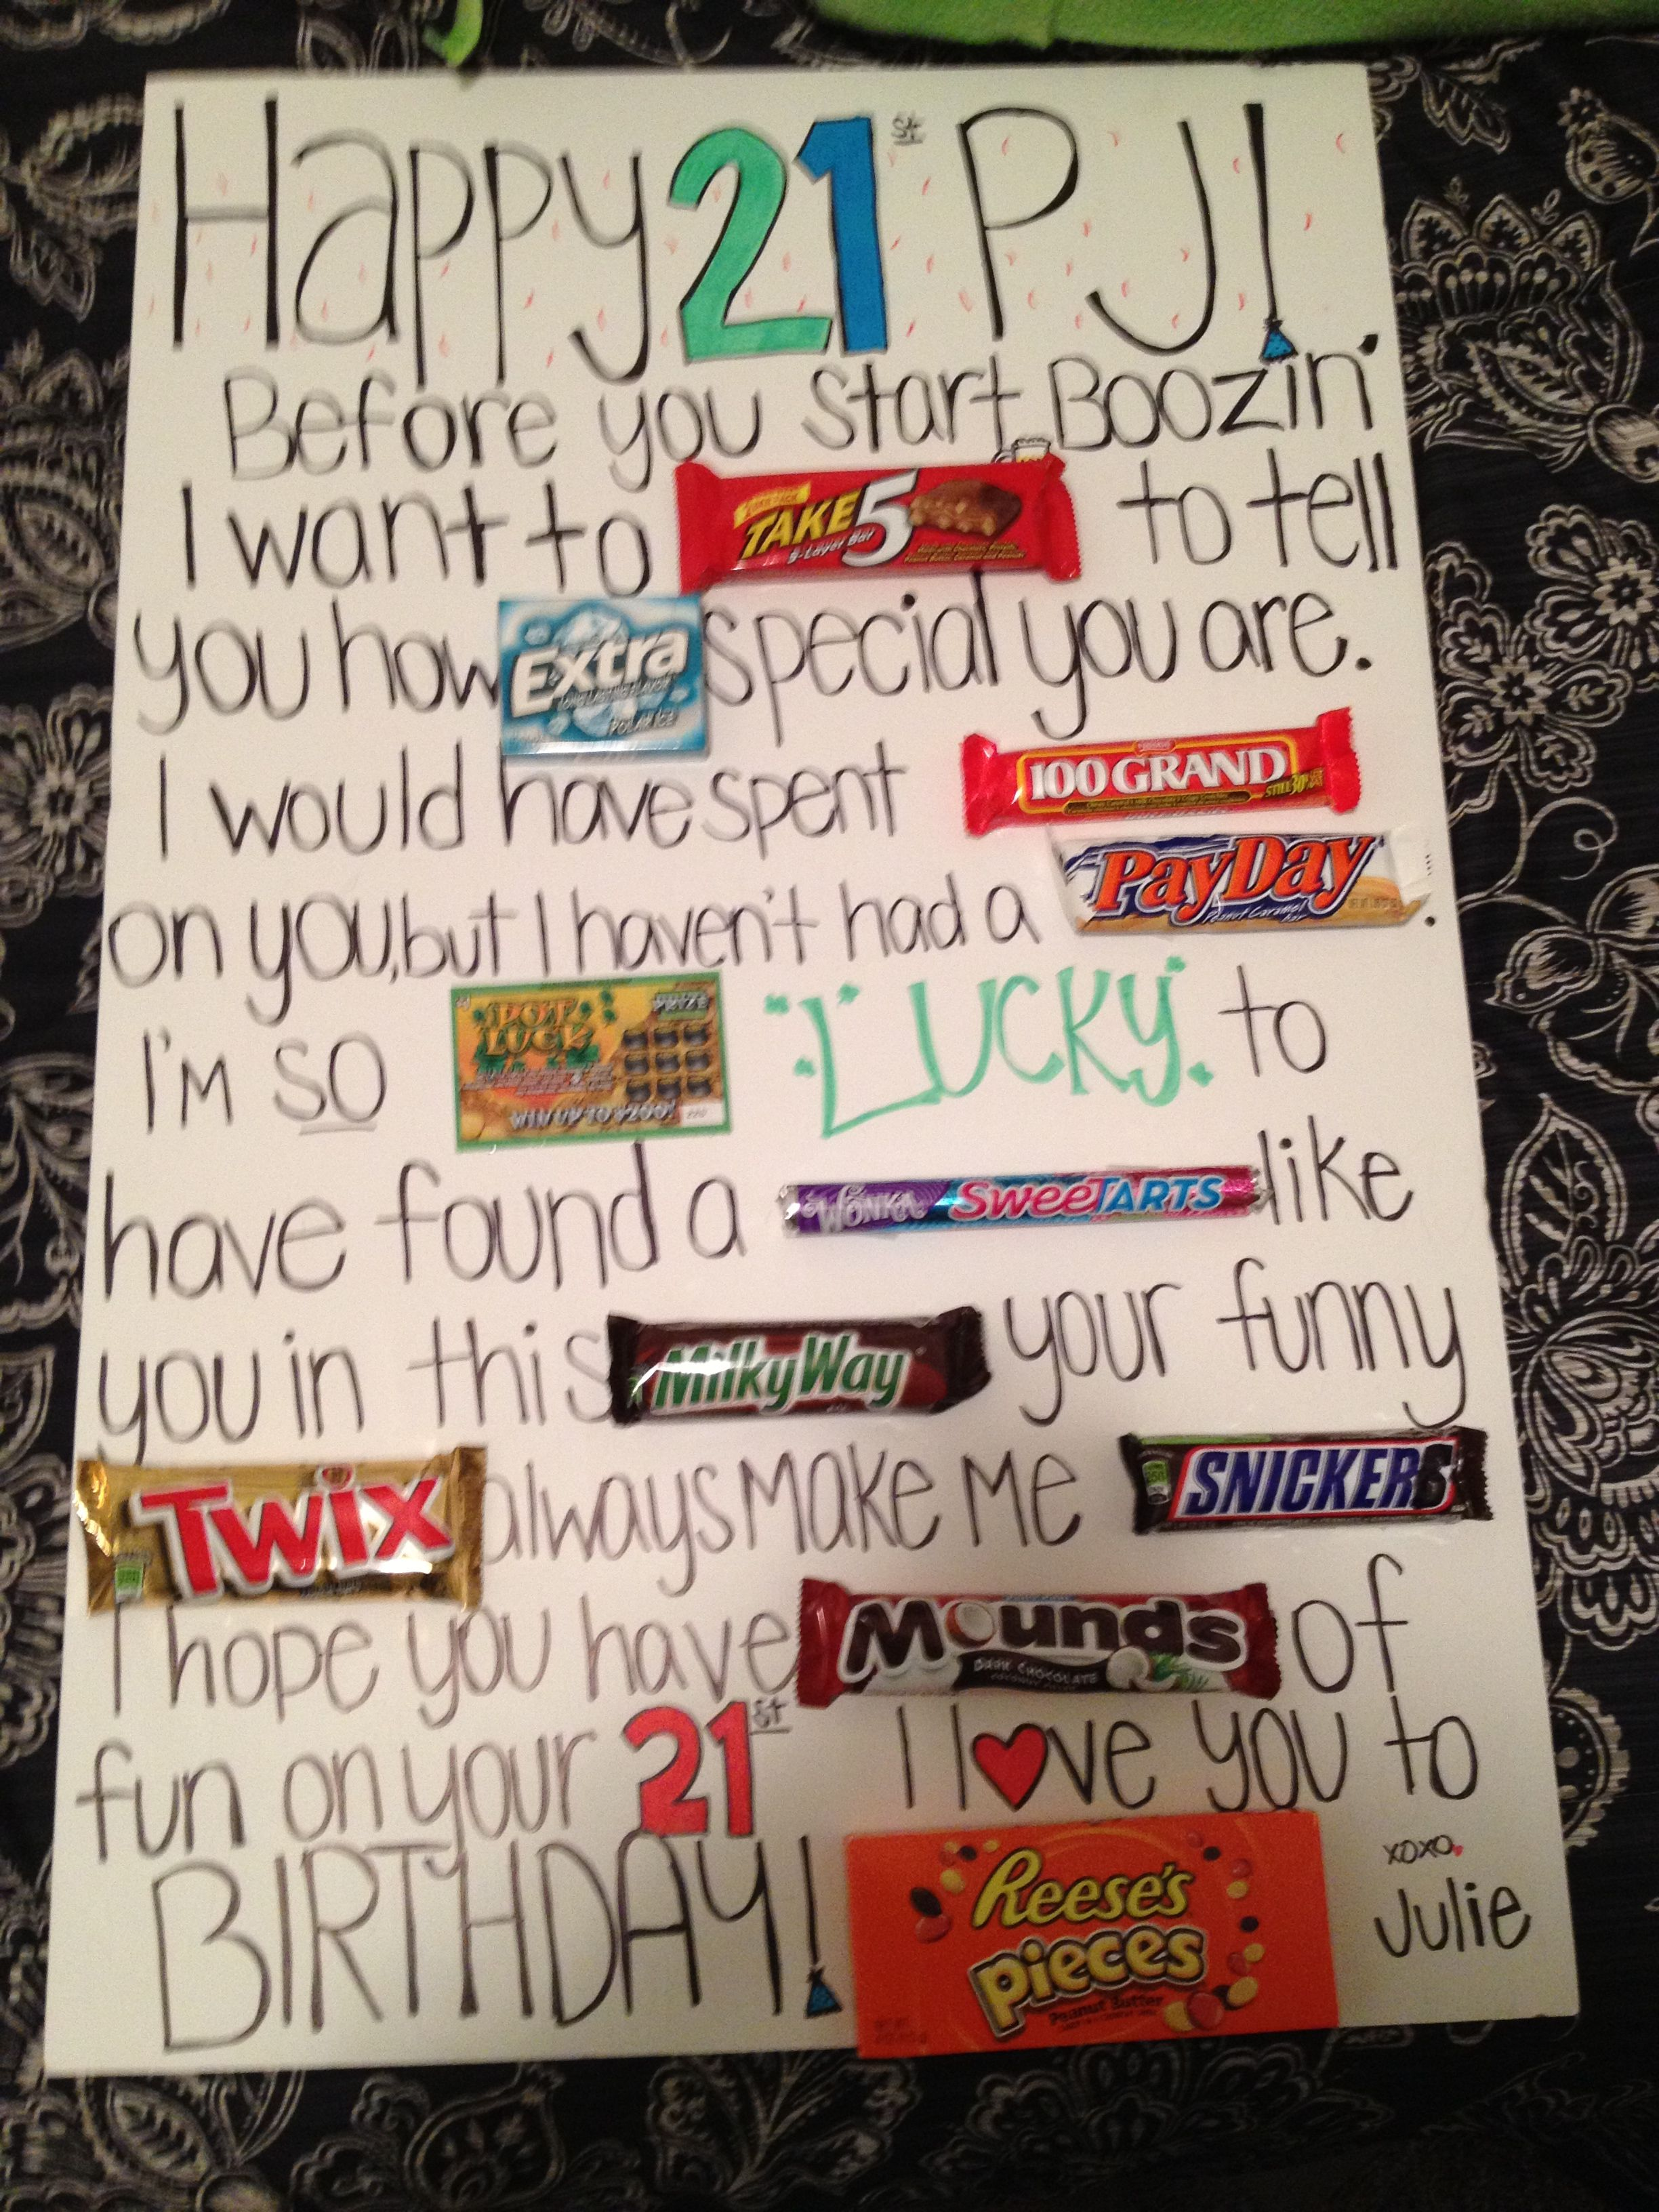 Boyfriends birthday card  Cute loving ideas (boyfriend)  Pinterest